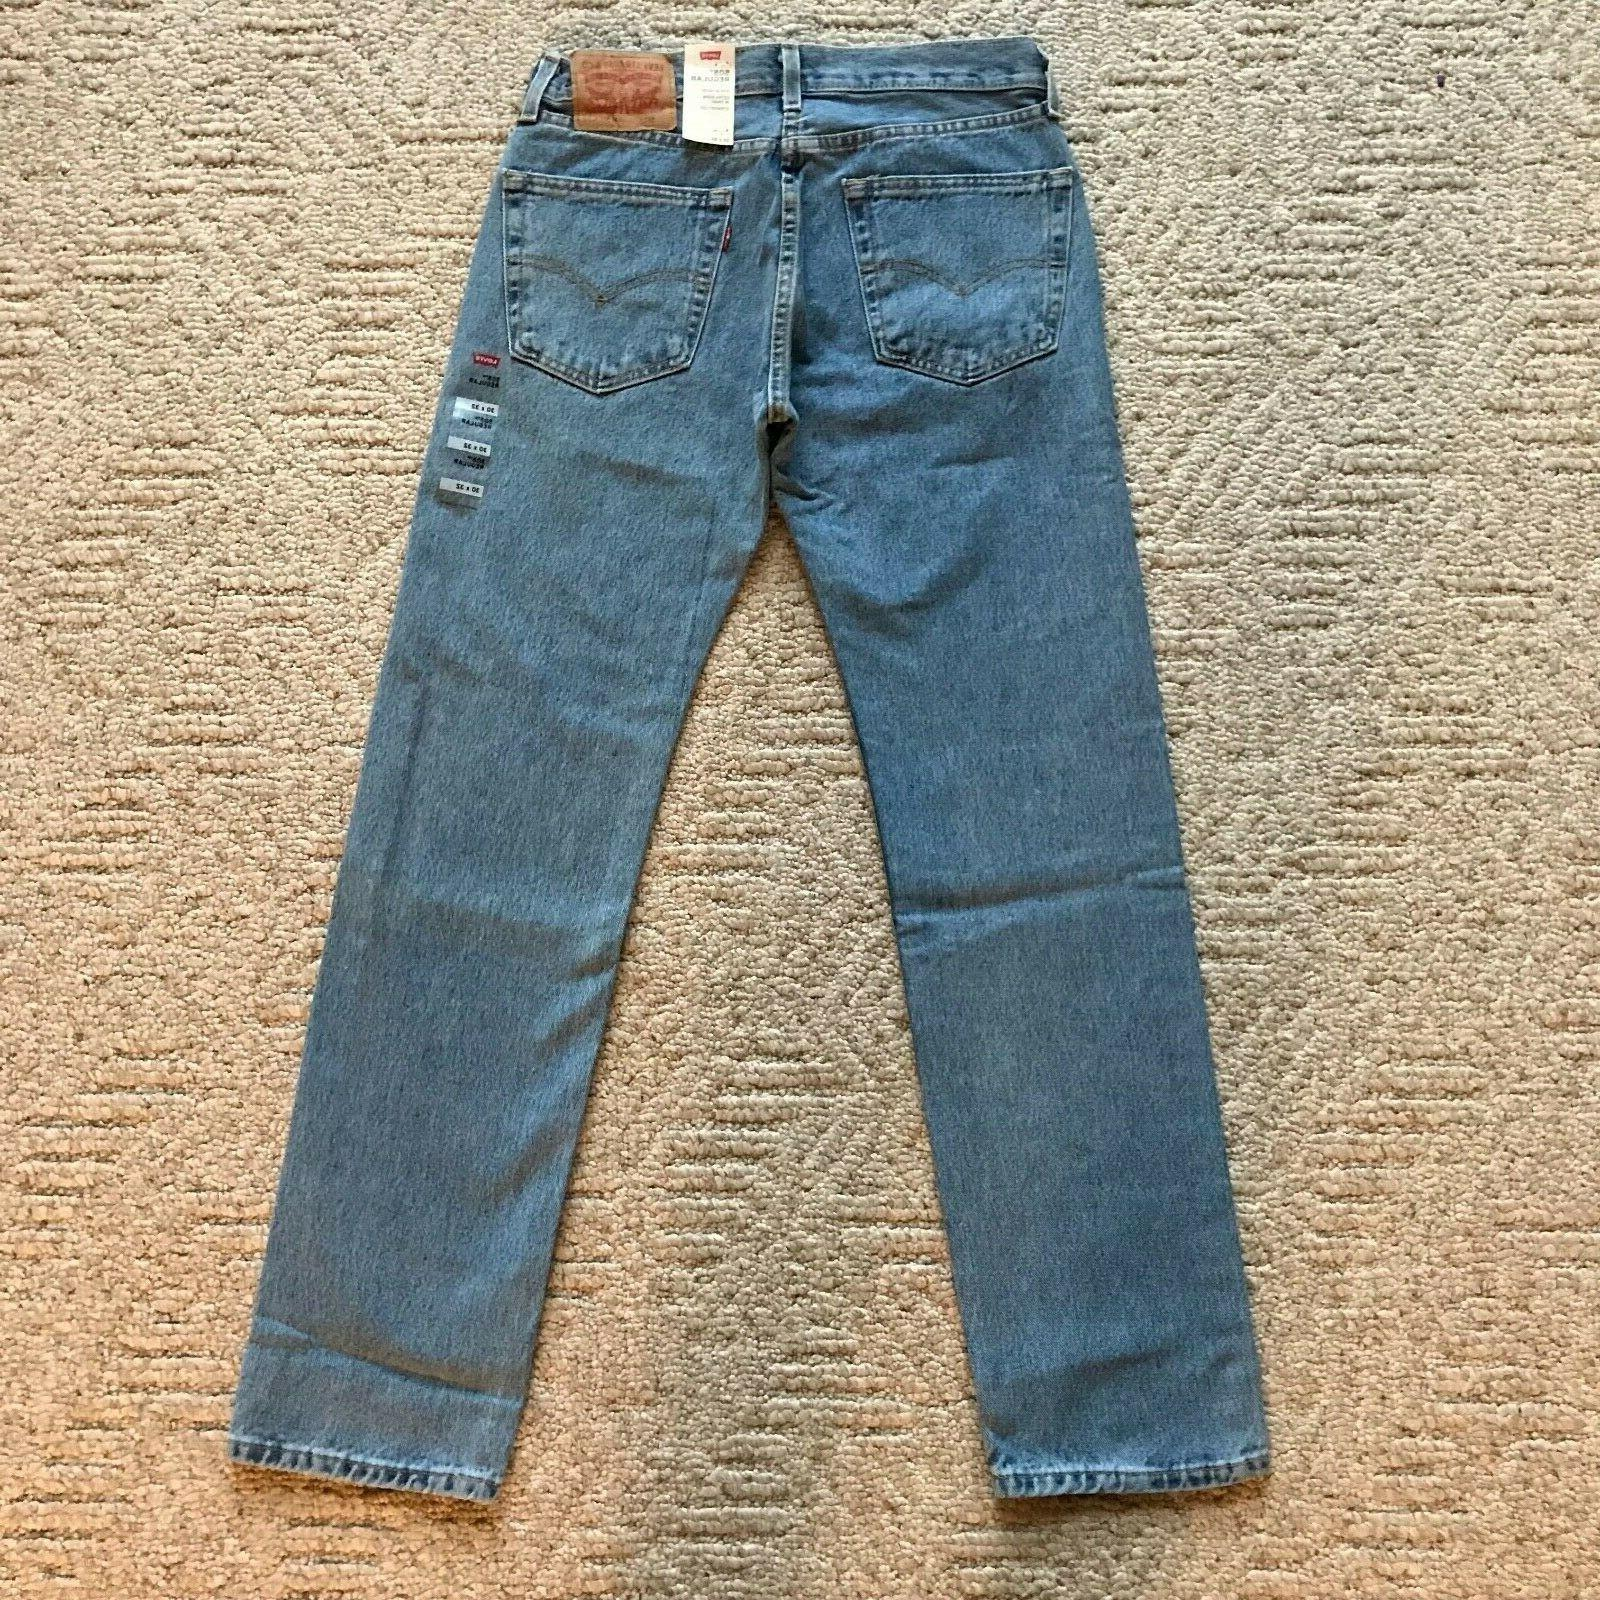 NWT Levi's Men's Classic Regular Leg Denim Jeans All